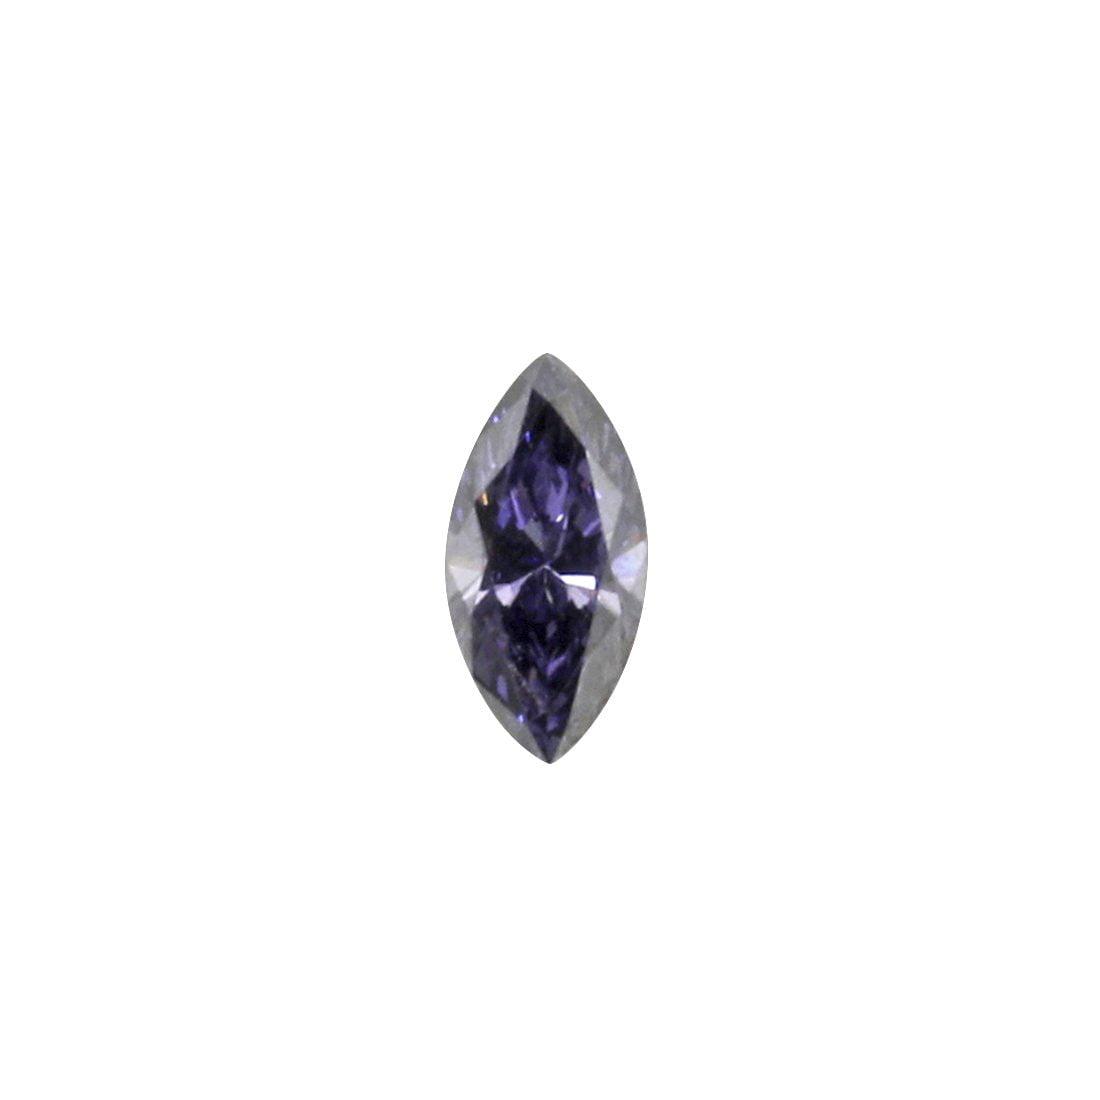 0.10ct Natural Fancy Deep Violetish Blue Argyle Diamond